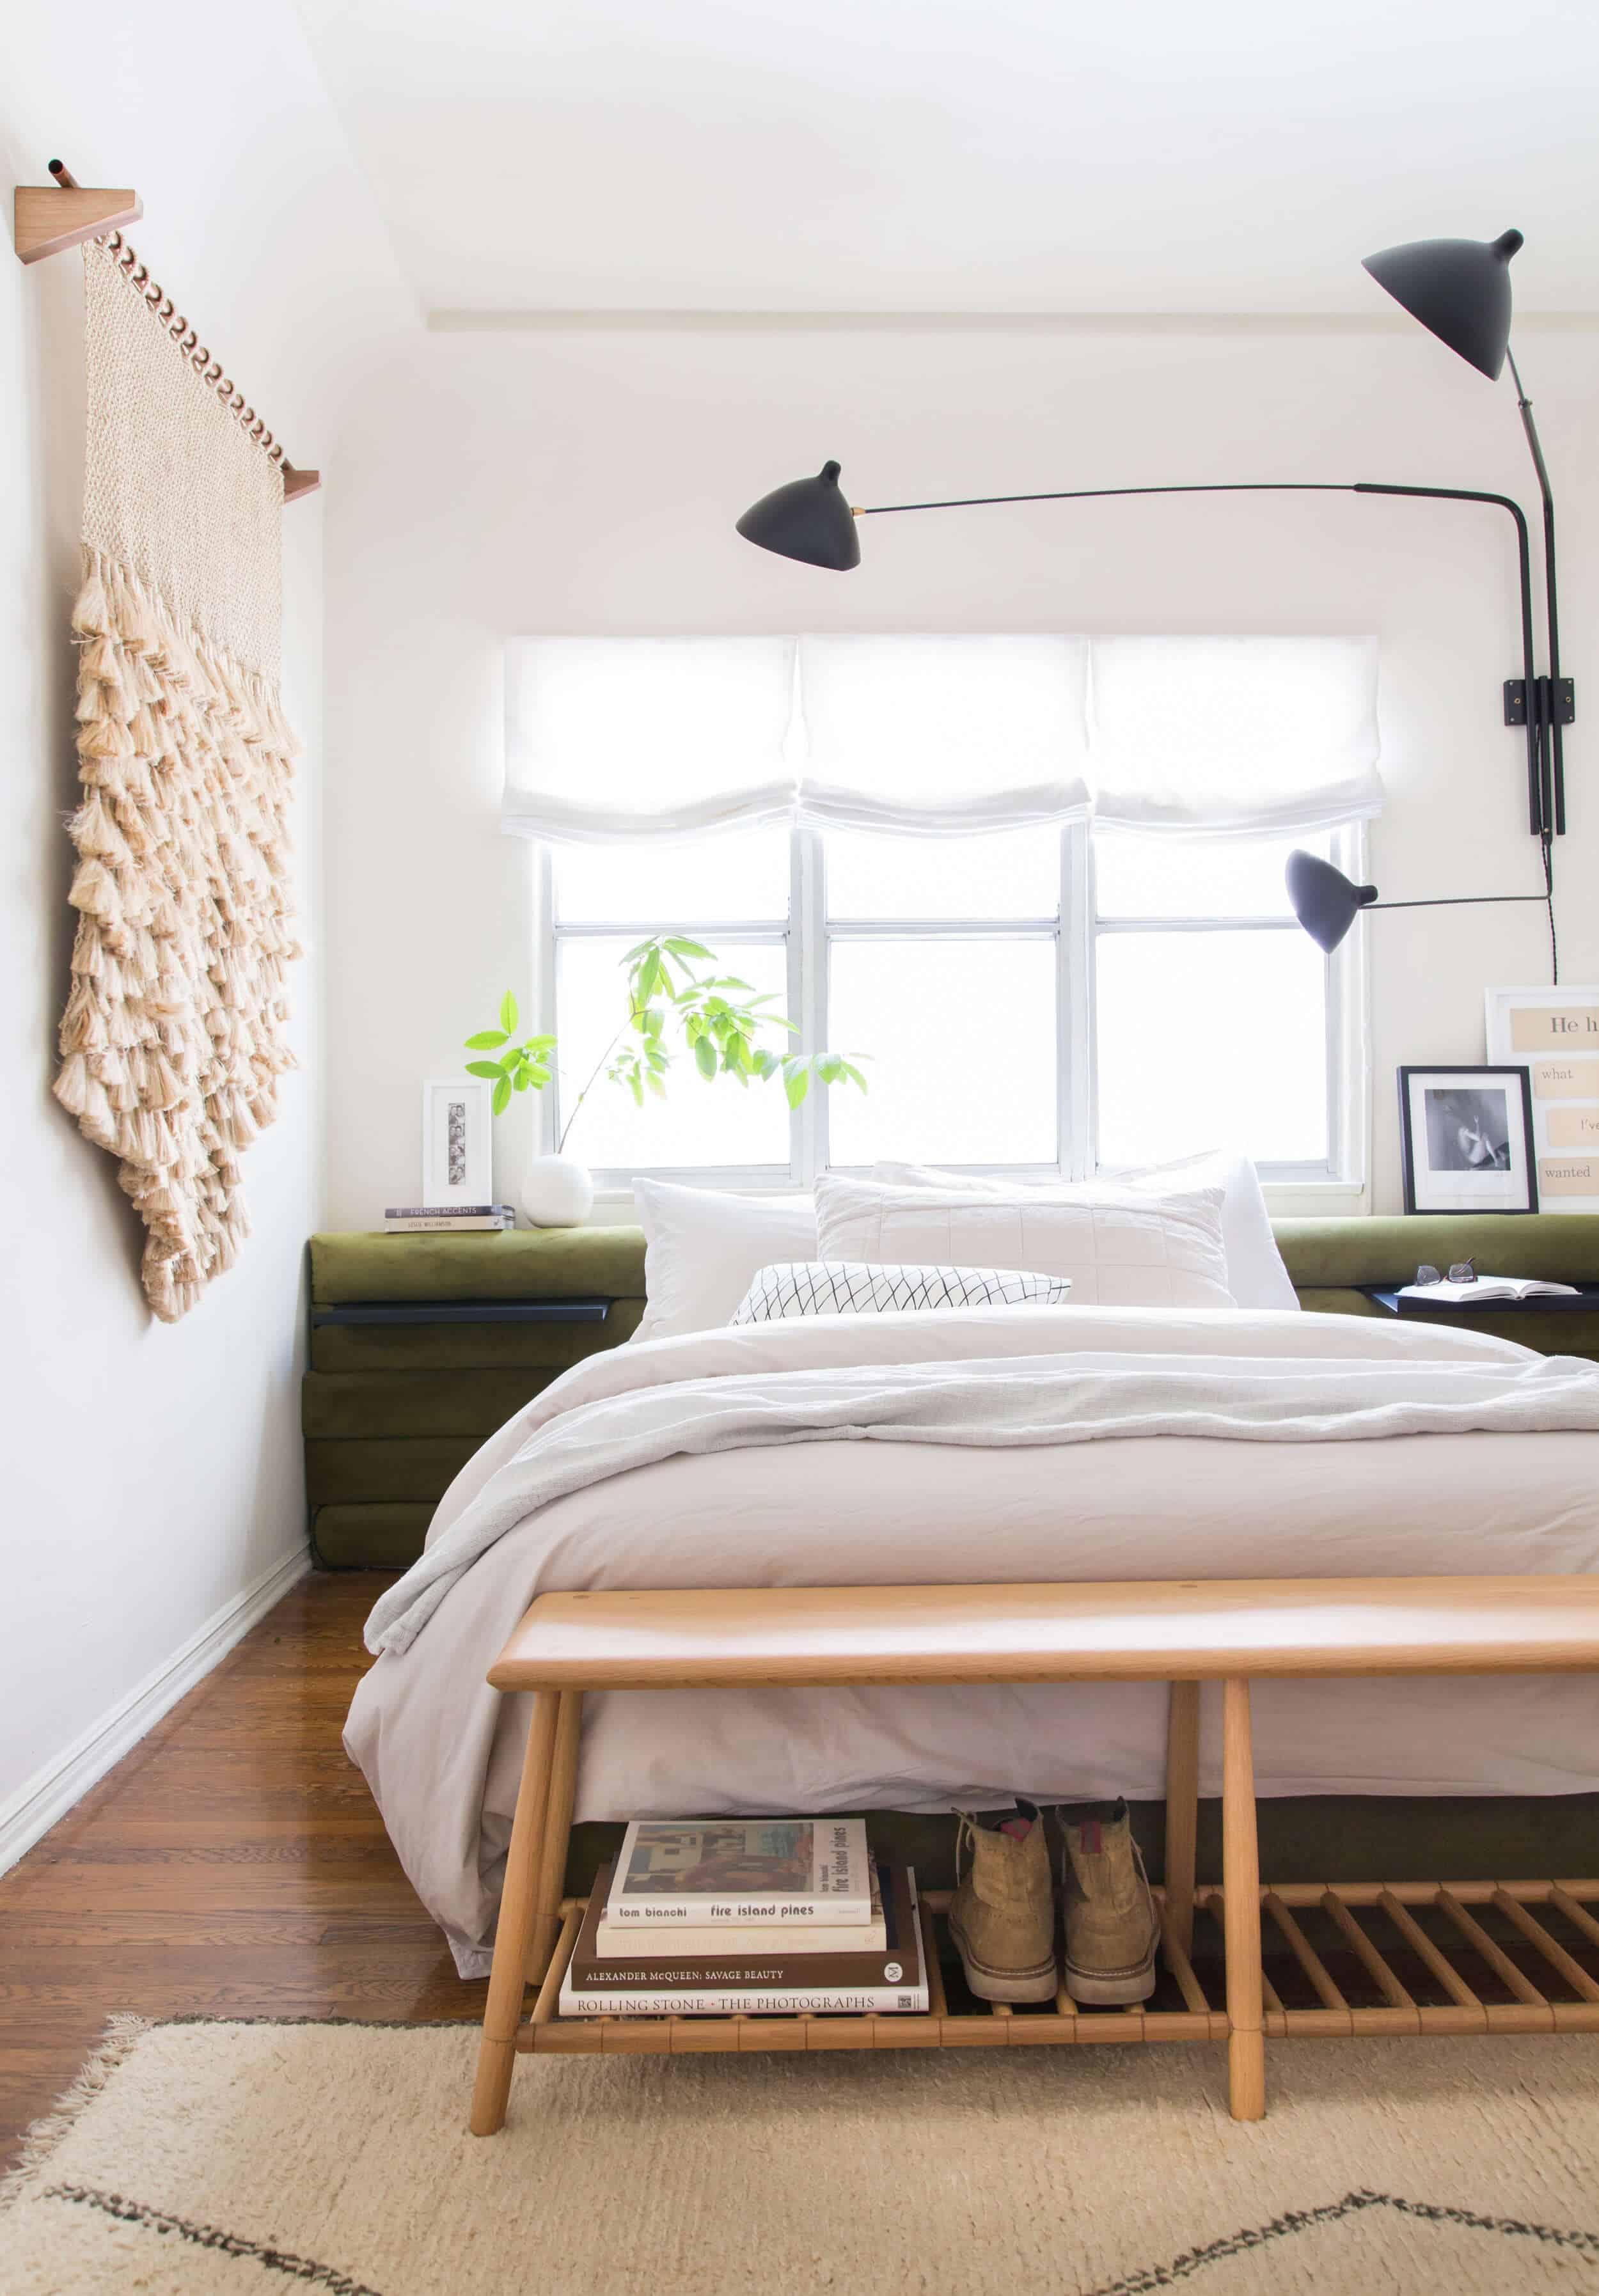 Emily-Henderson_MOTO_Brady_Bedroom_Parachute_Edited_14